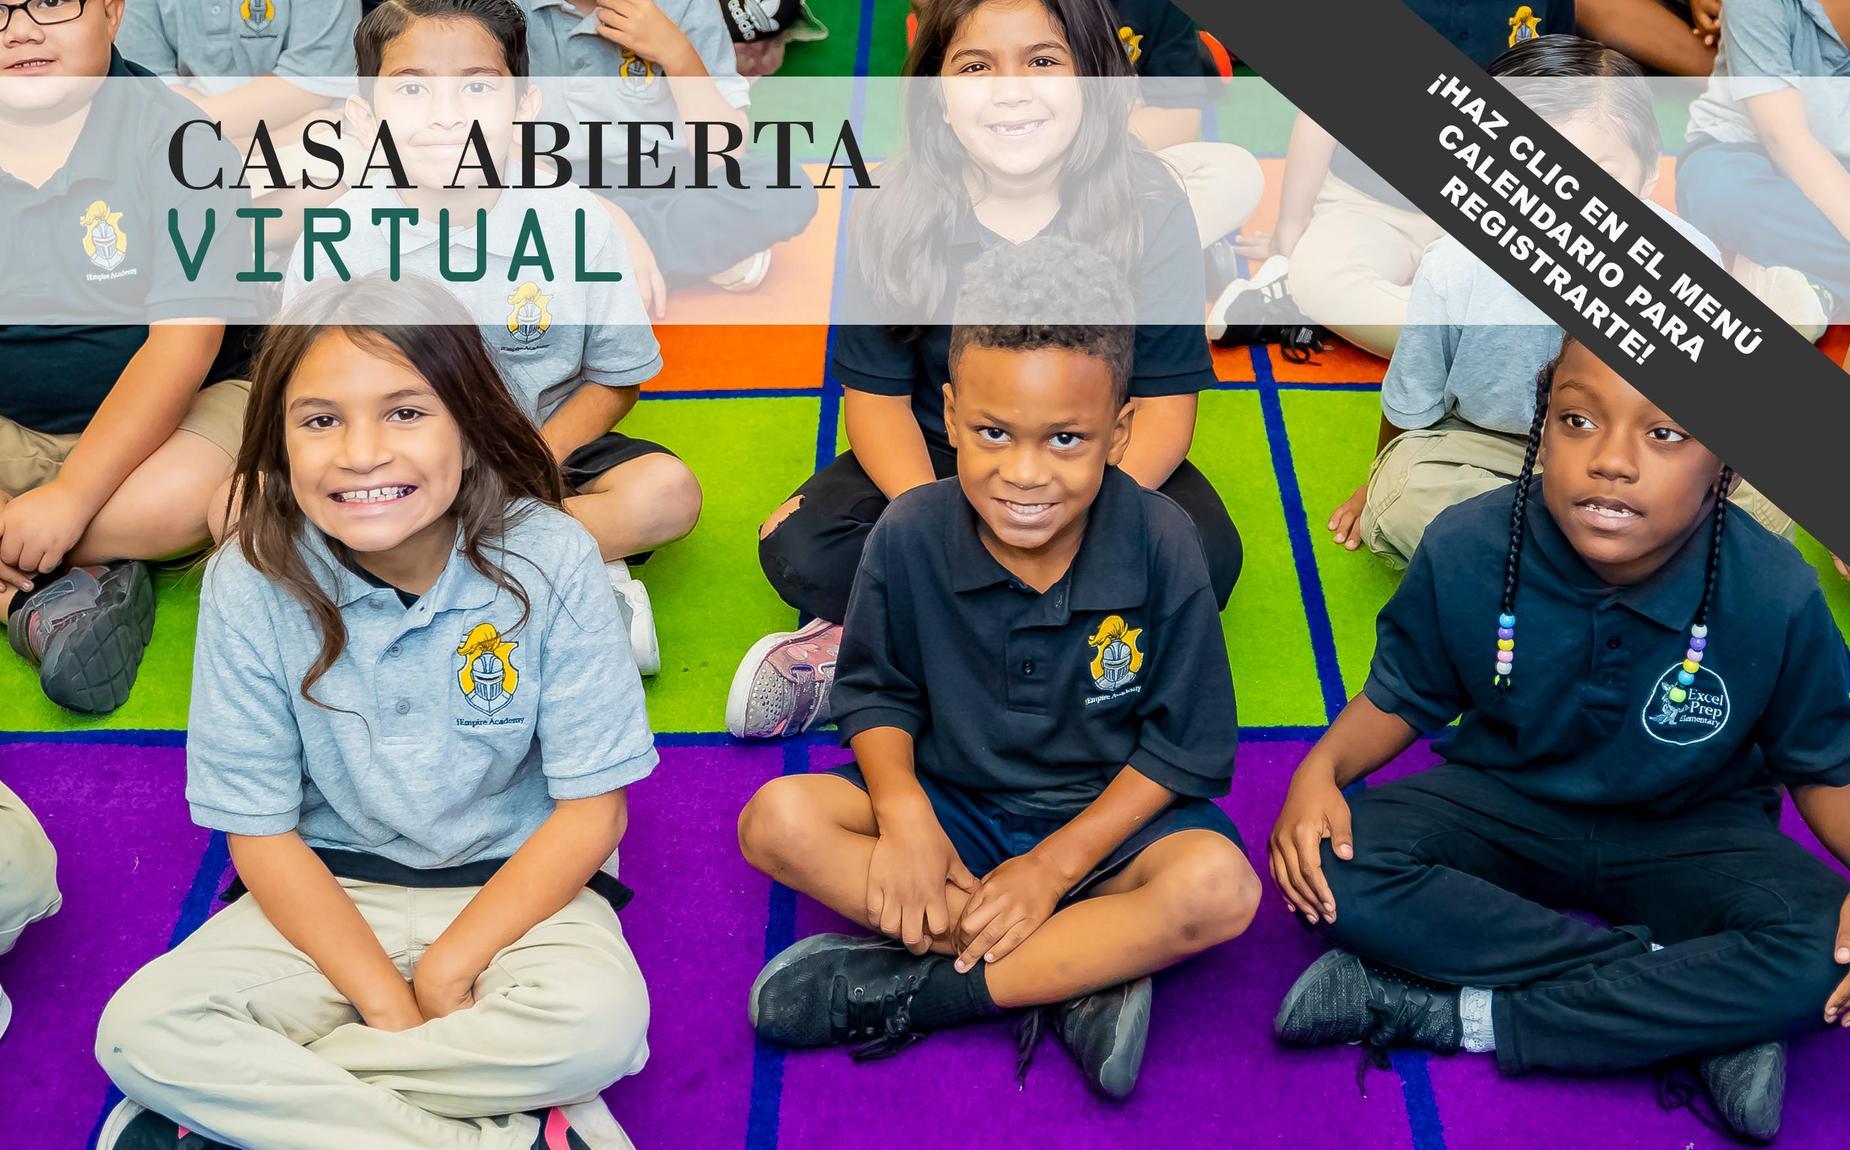 Casa Abierta Flyer. Background picture of 6 students sitting on the kinder reading carpet in class. Flyer reads: Casa Abierta Virtual and Haz clic en el menu calendario para registrarte!